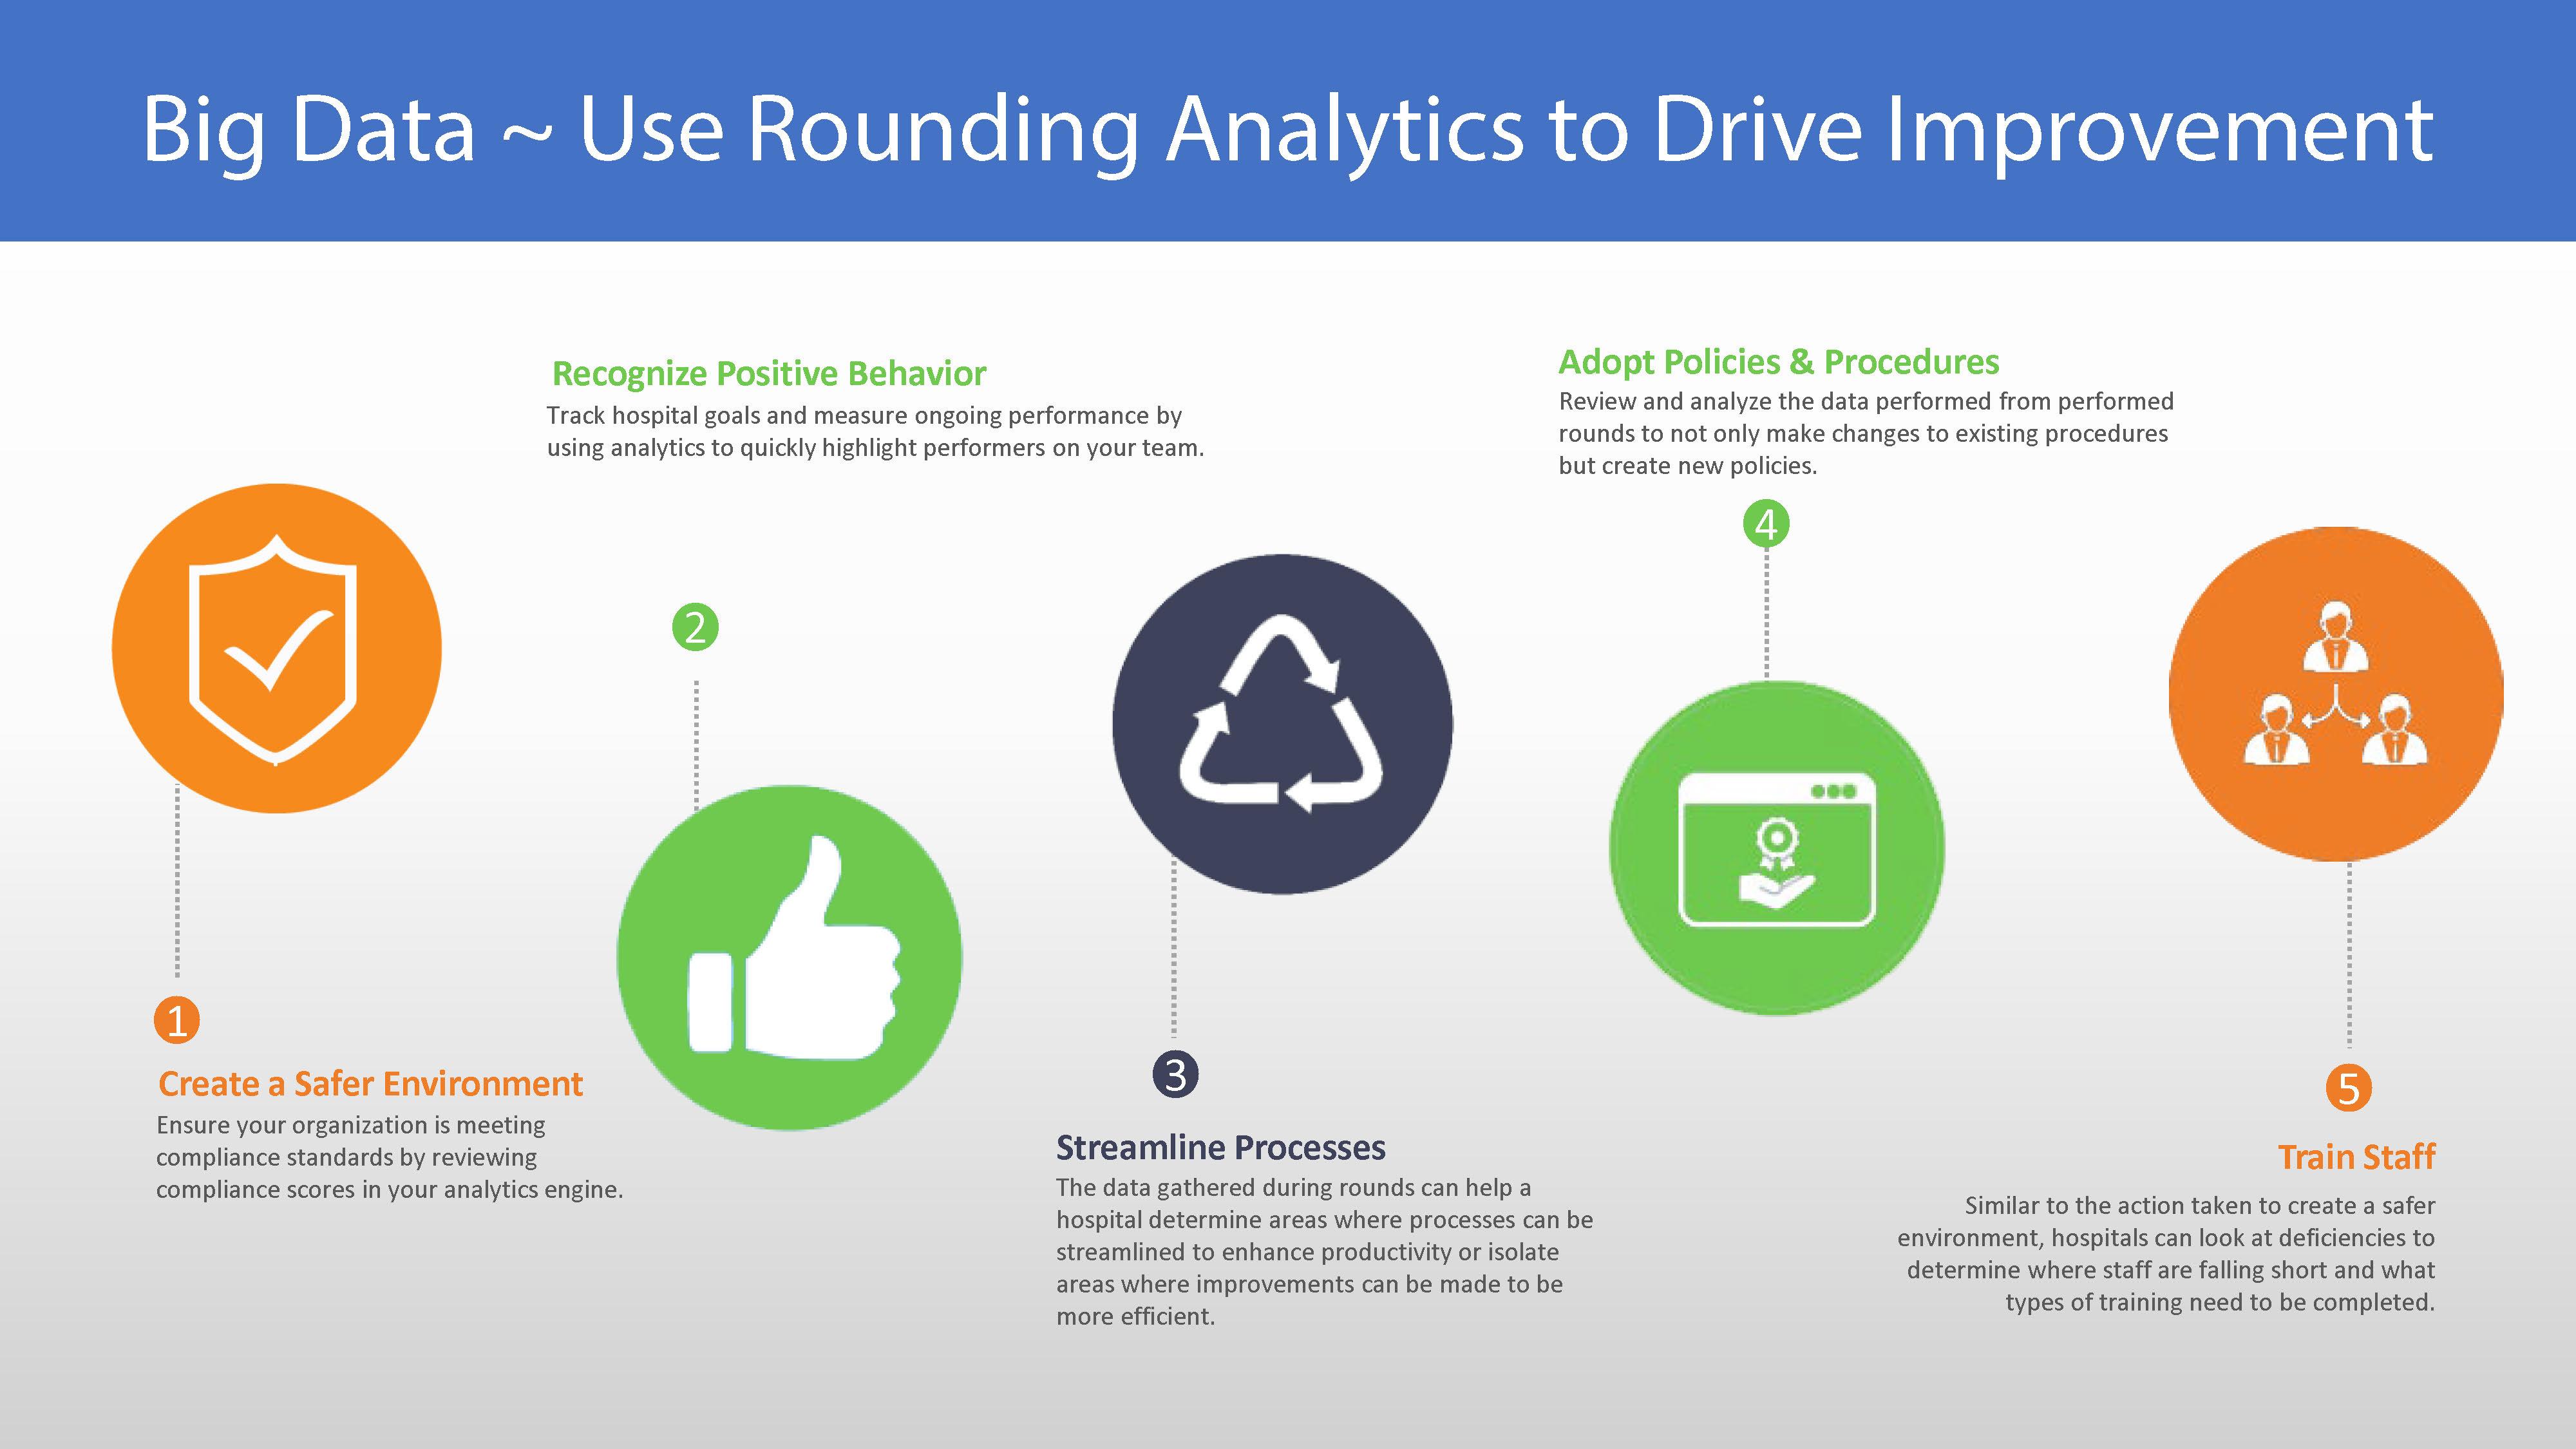 AnalyticsDriveRoundingInitiatives